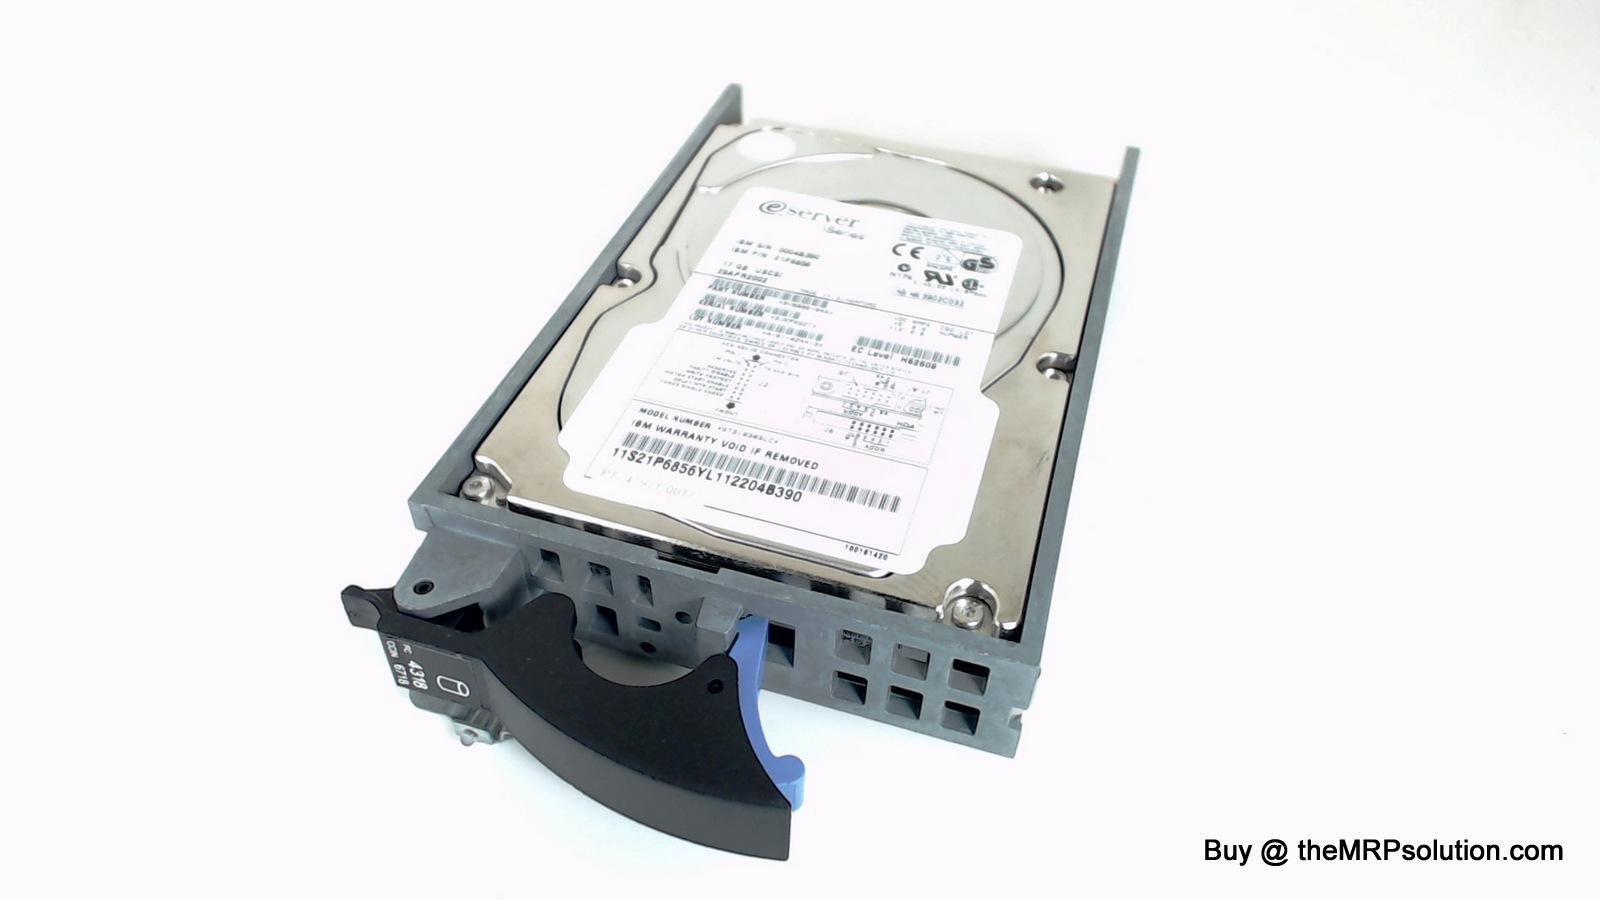 IBM 53P5458 18GB, 10K, SCSI HDA, FC 4318 New